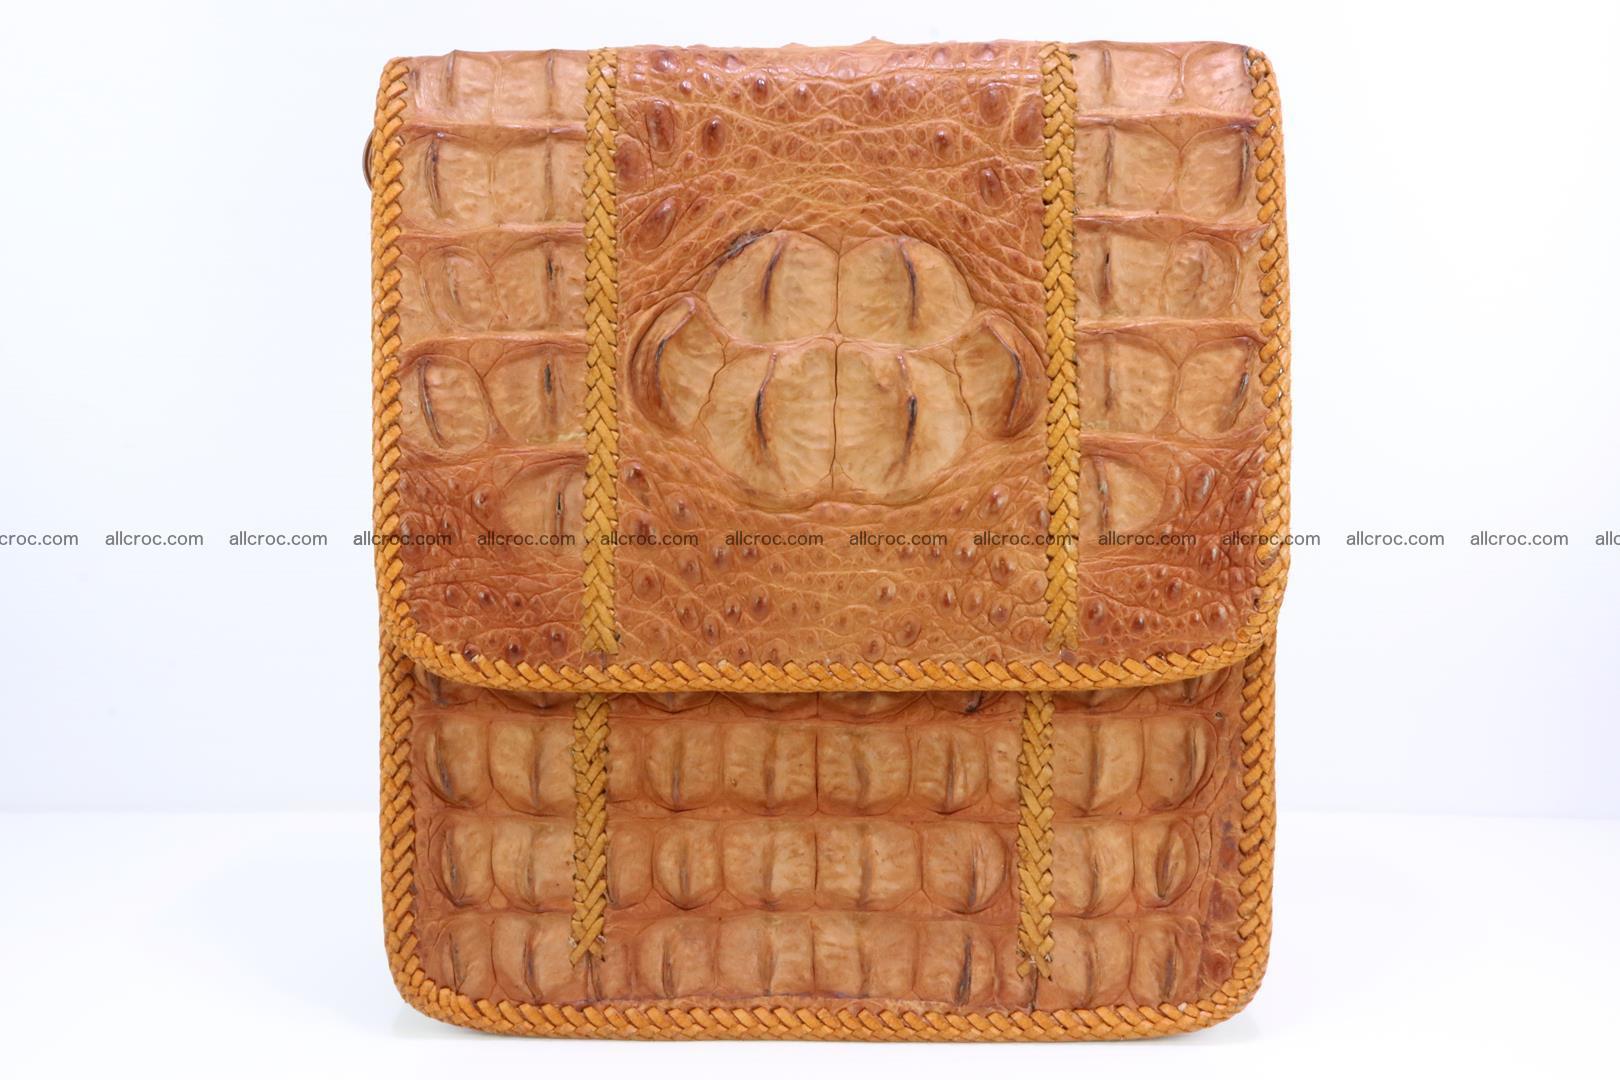 Сrocodile skin shoulder bag with braided edges 141 Foto 0